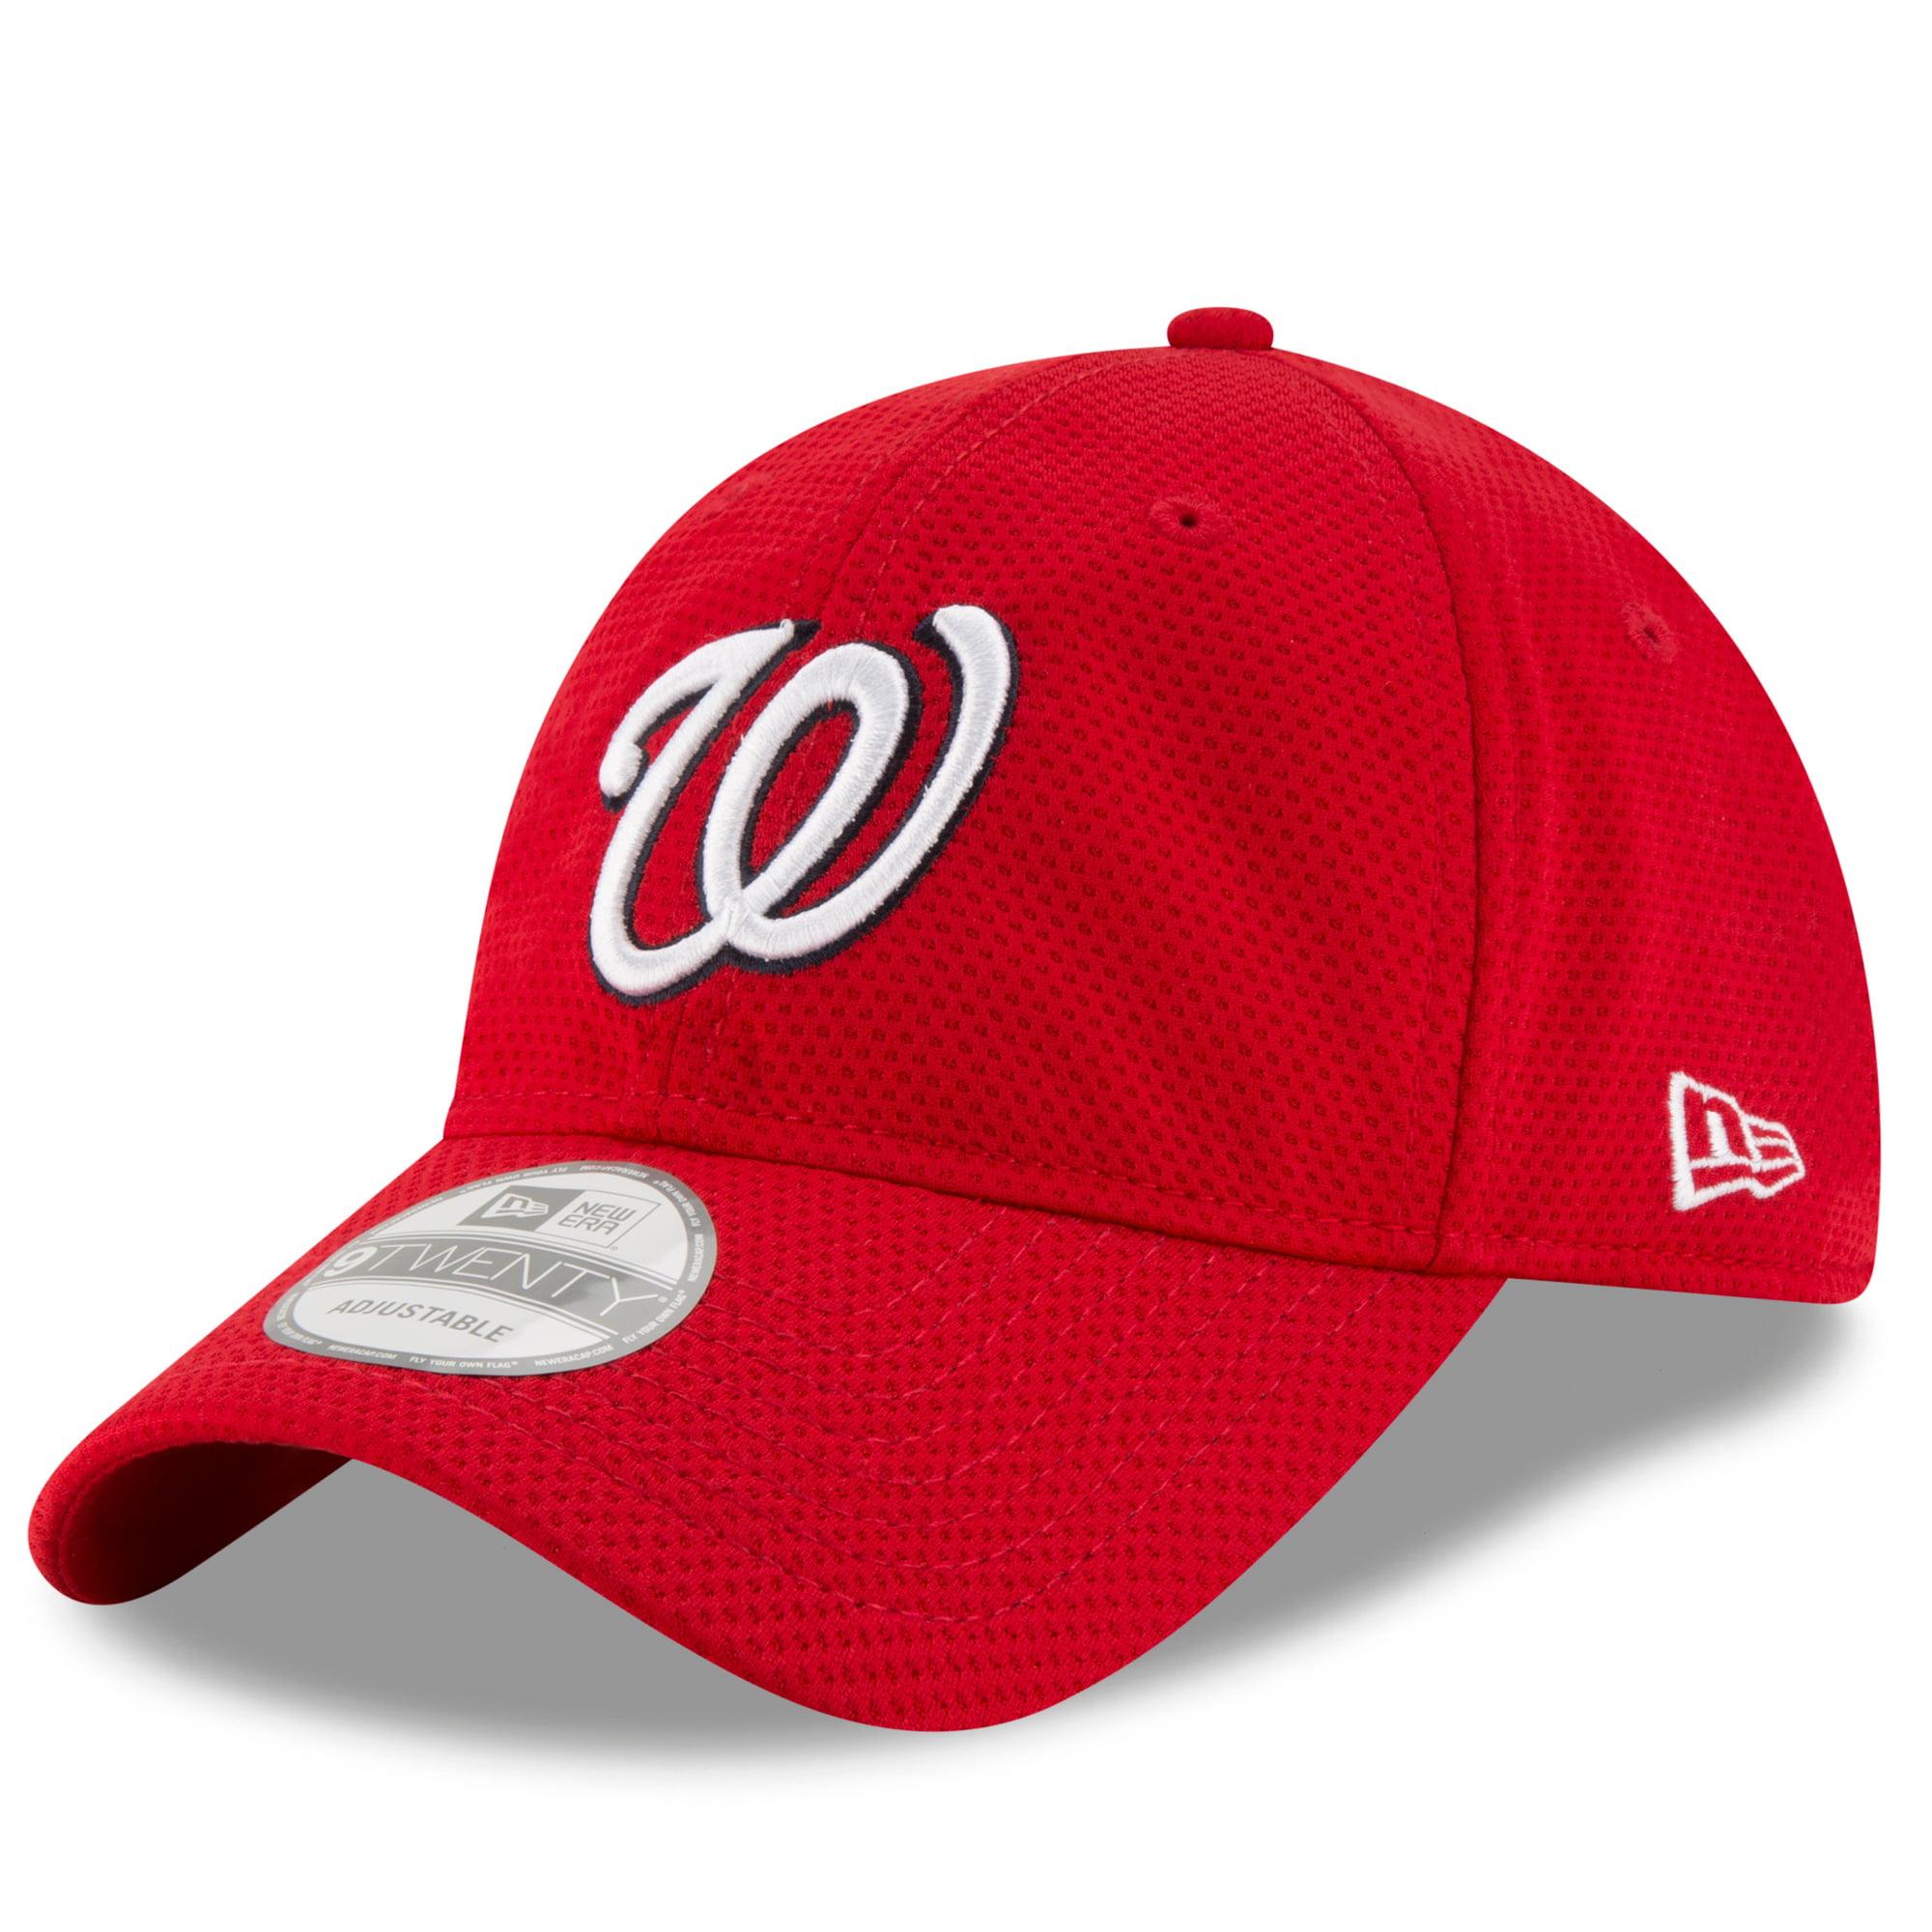 Washington Nationals New Era Shore Performance 9TWENTY Adjustable Hat - Red - OSFA